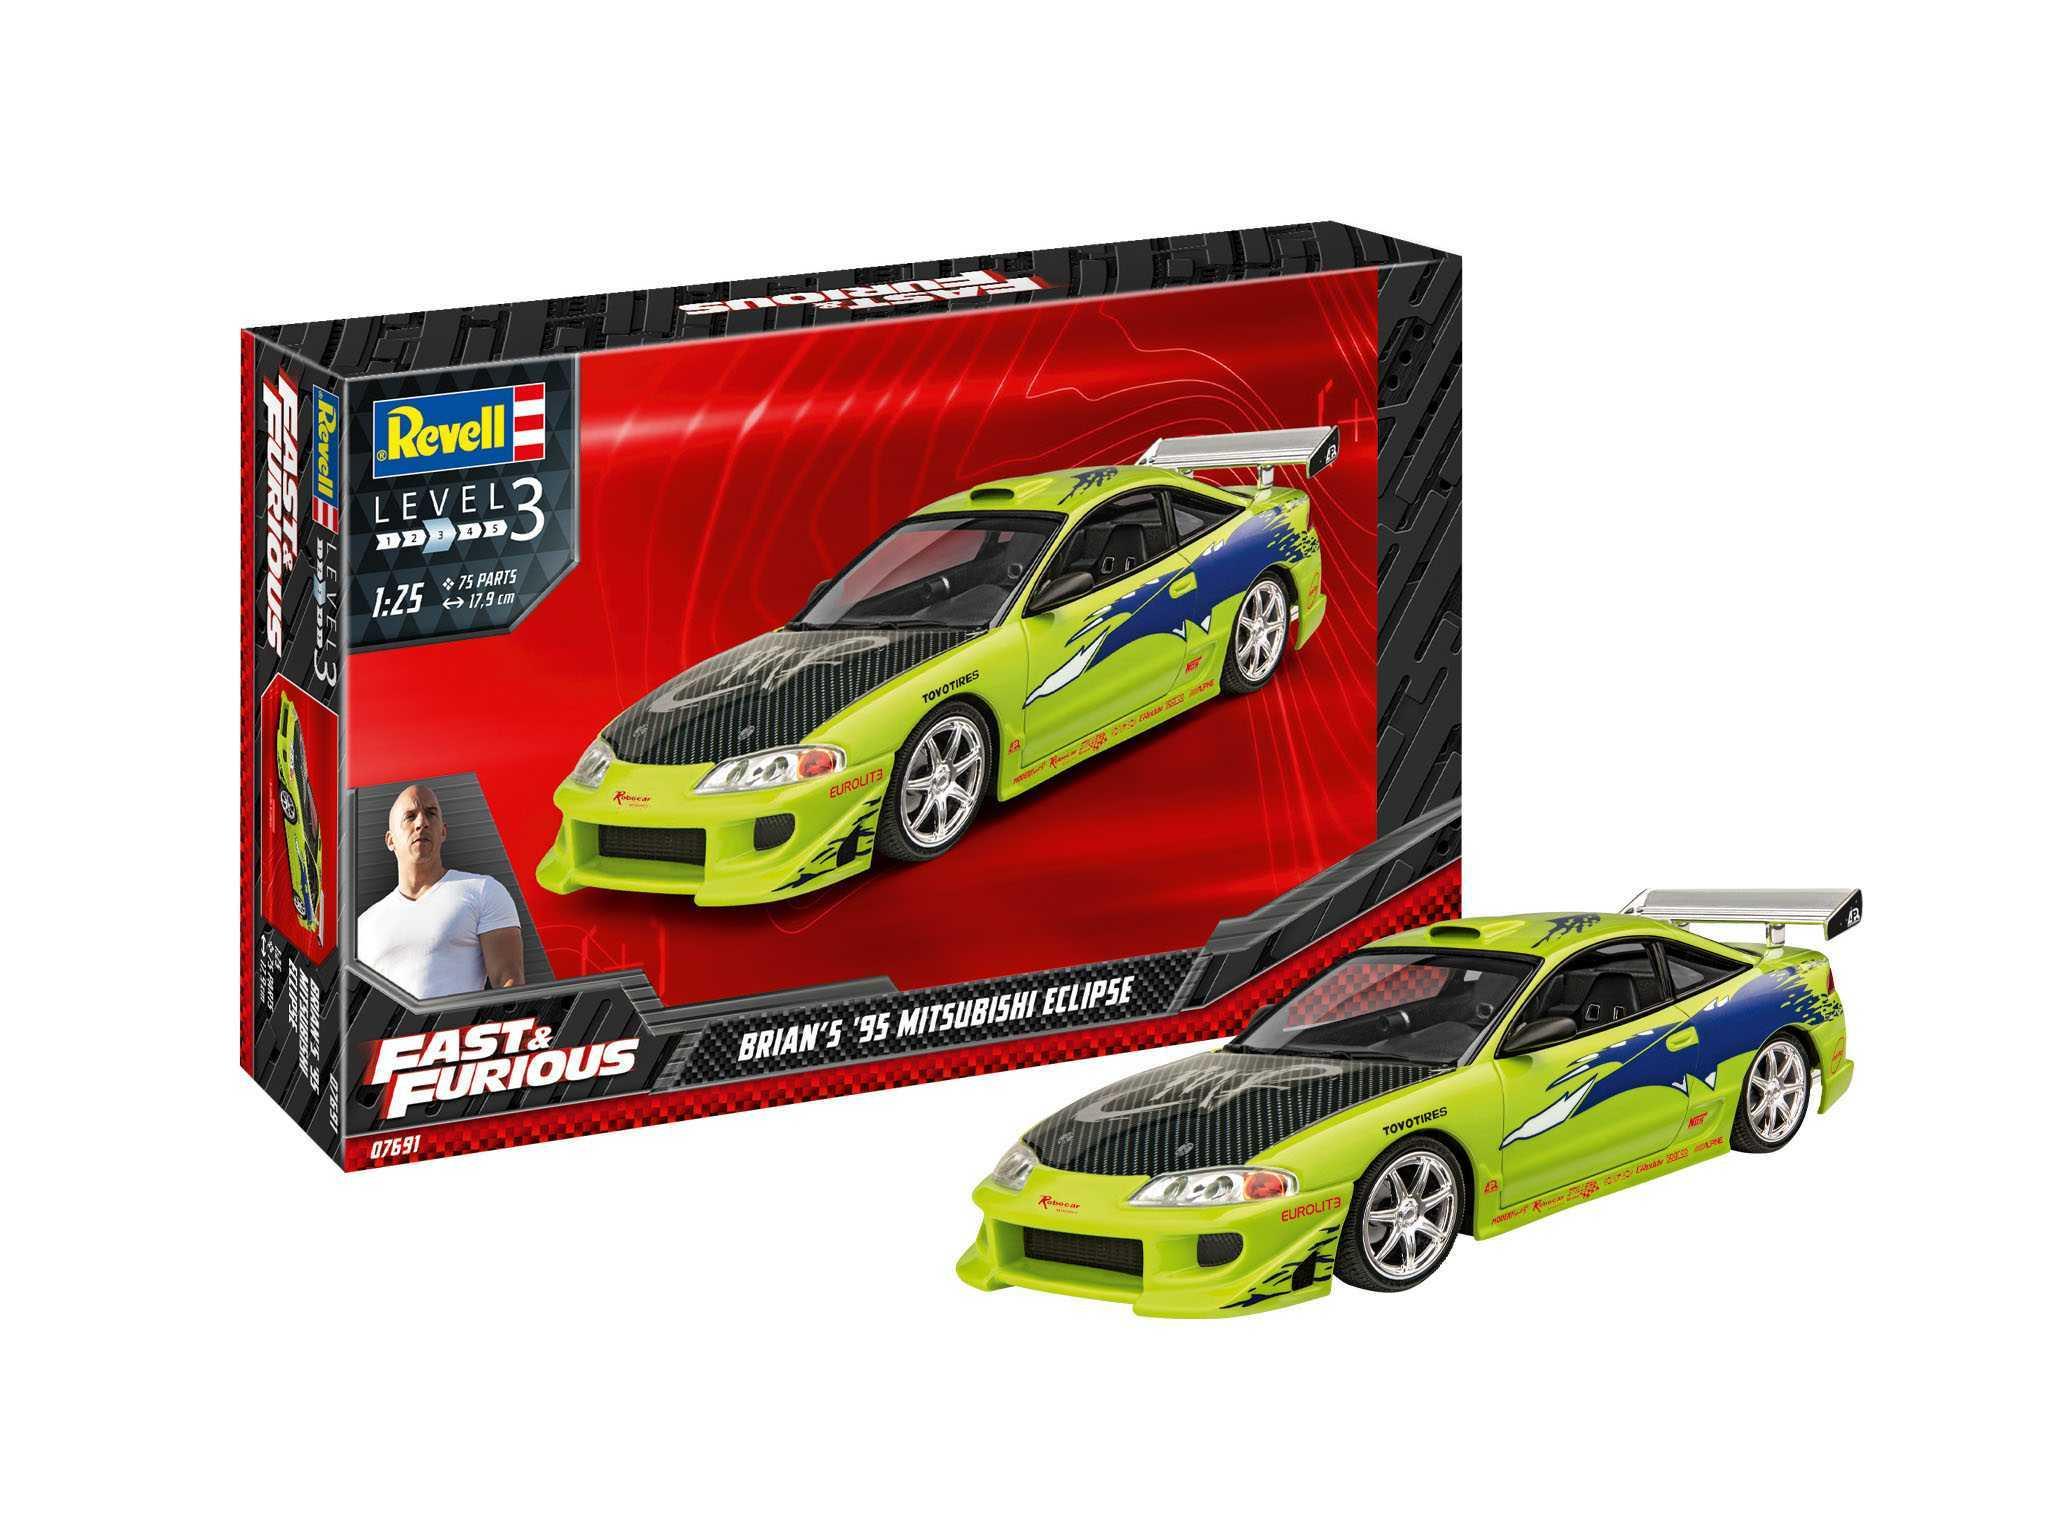 1:25 Fast & Furious Brian's 1995 Mitsubishi Eclipse (Model Set)